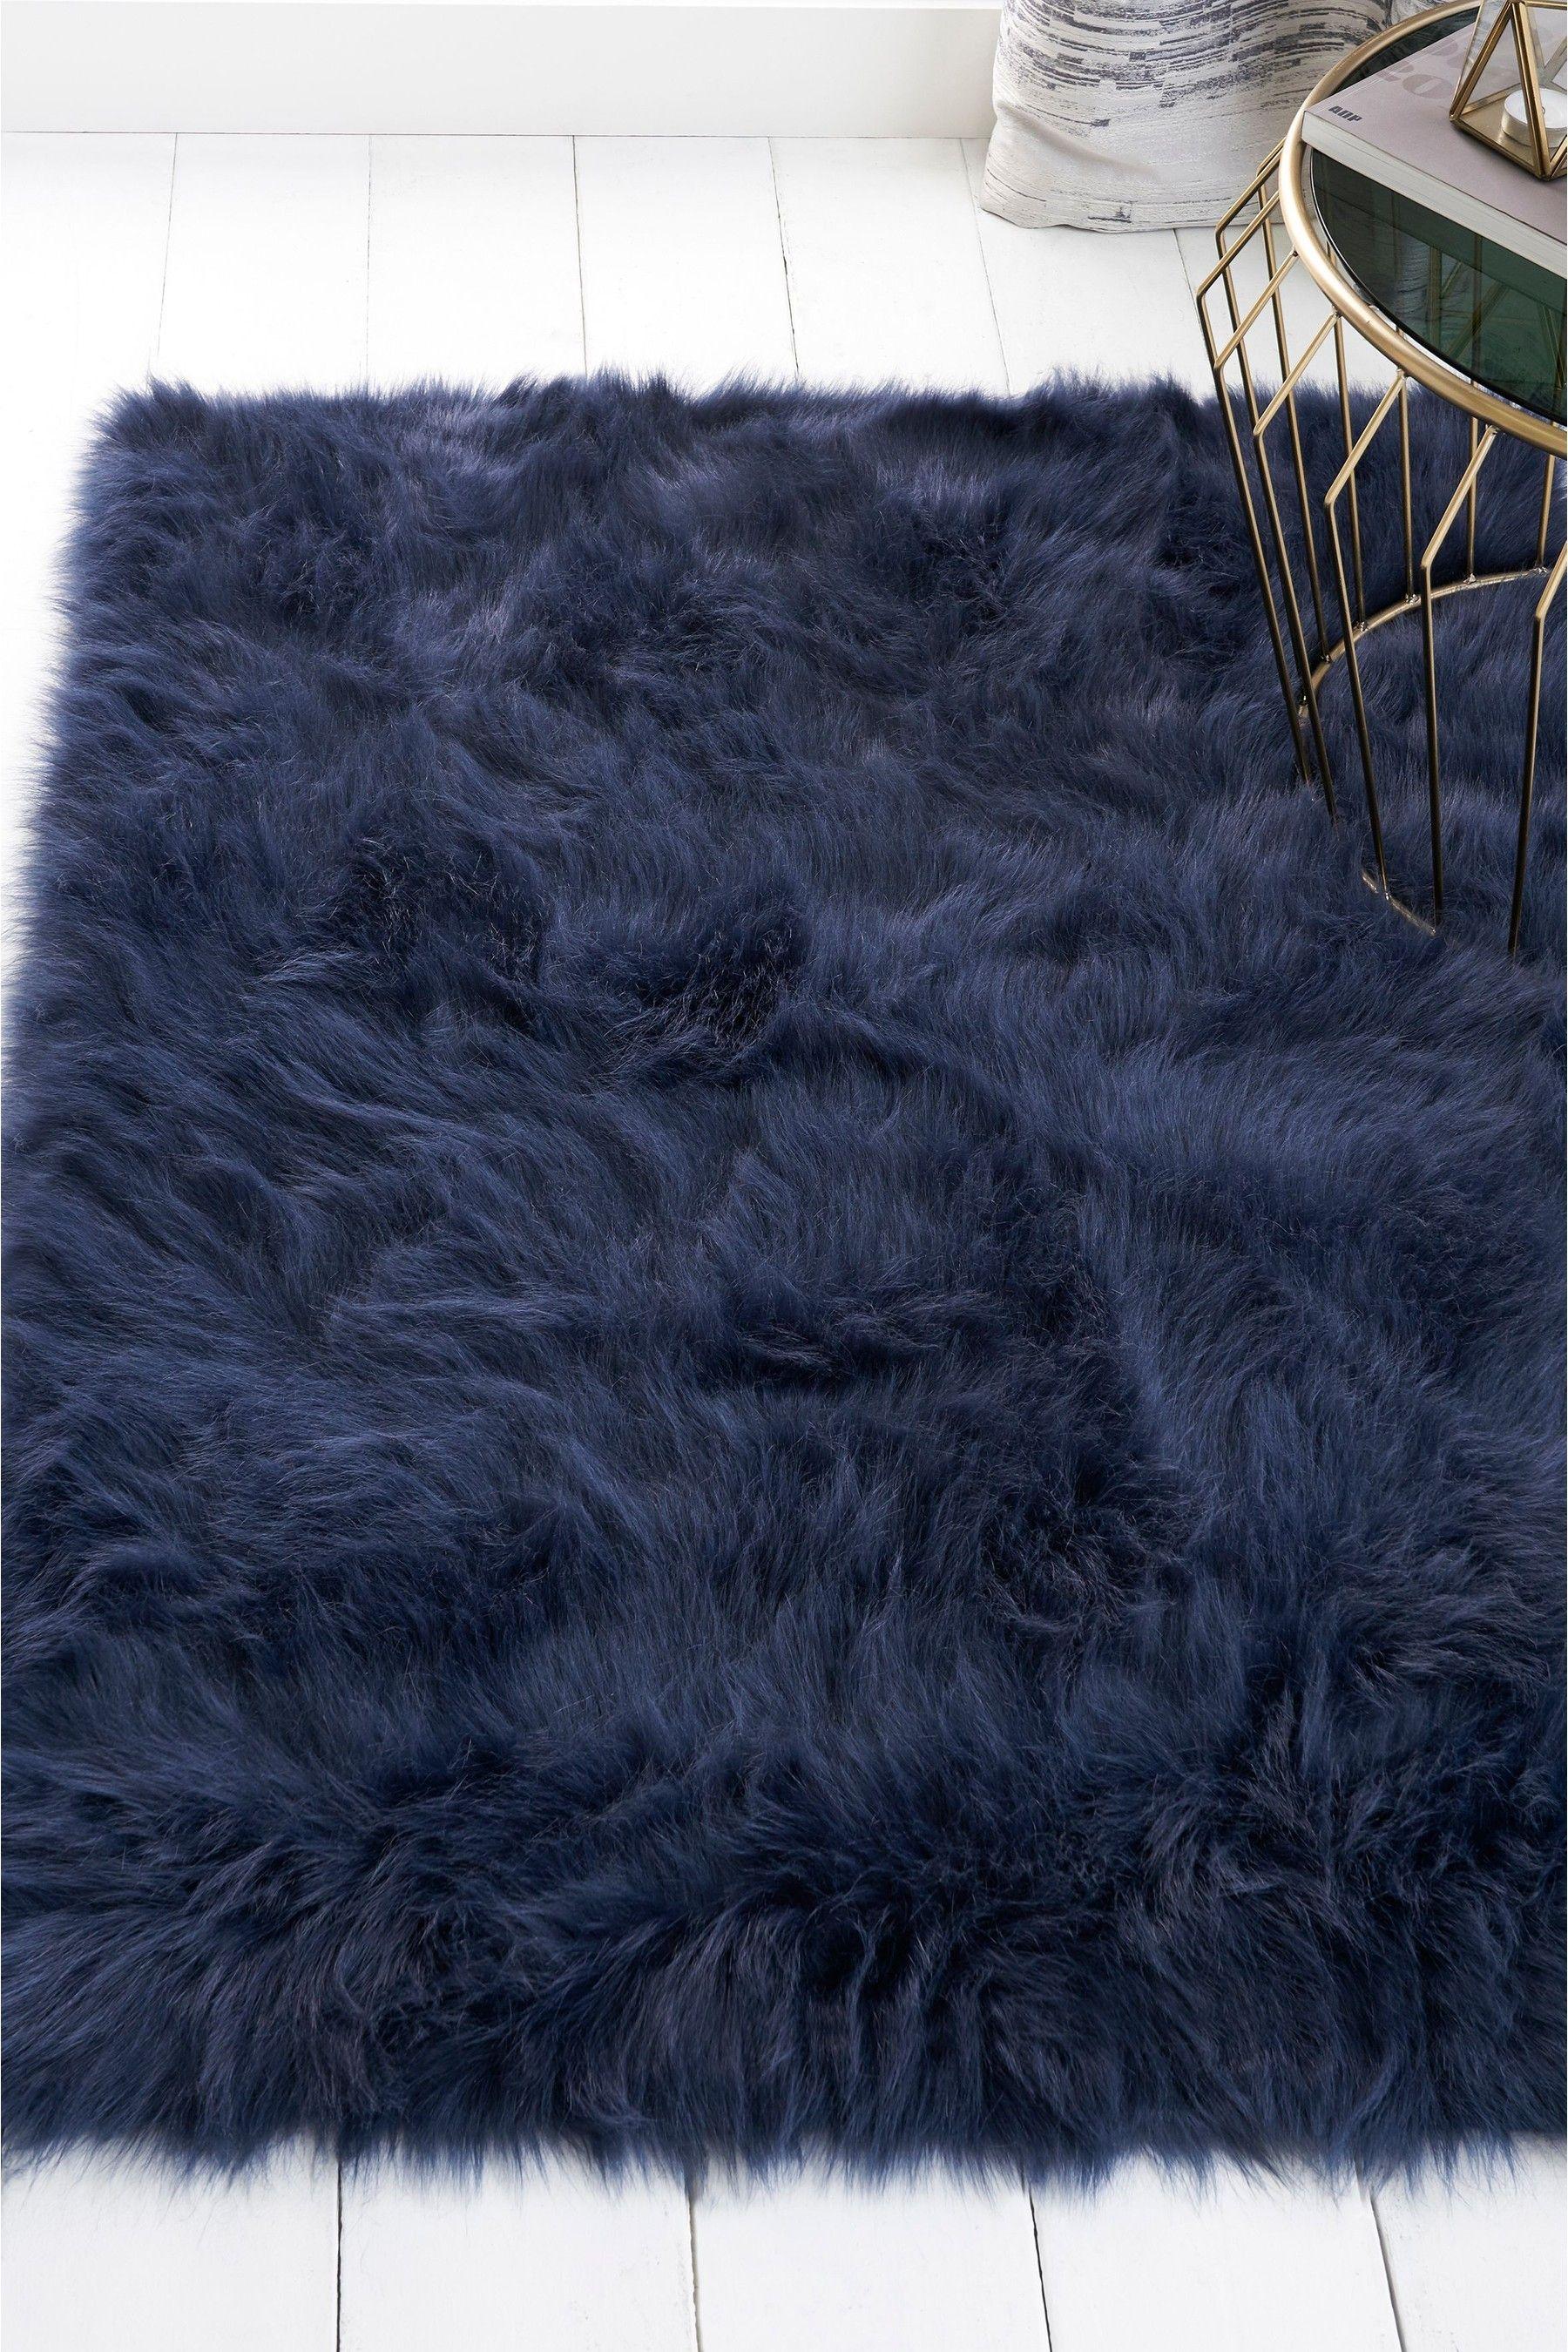 Next Faux Sheepskin Rug Blue Fur Rug Living Room Faux Sheepskin Rug Faux Fur Rug